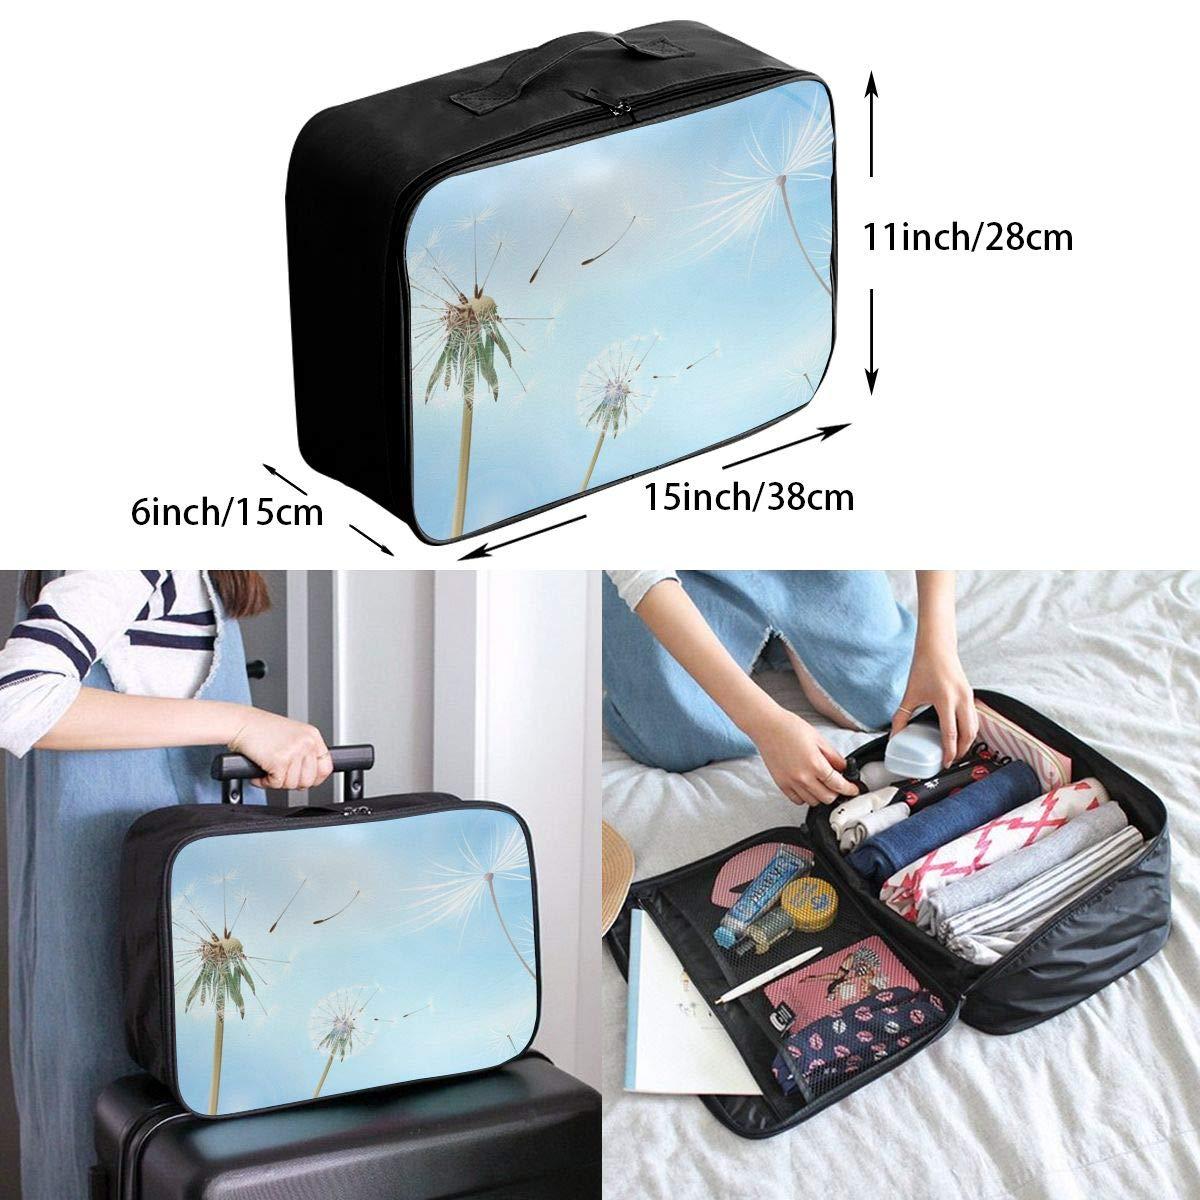 Travel Luggage Duffle Bag Lightweight Portable Handbag Dandelion Large Capacity Waterproof Foldable Storage Tote